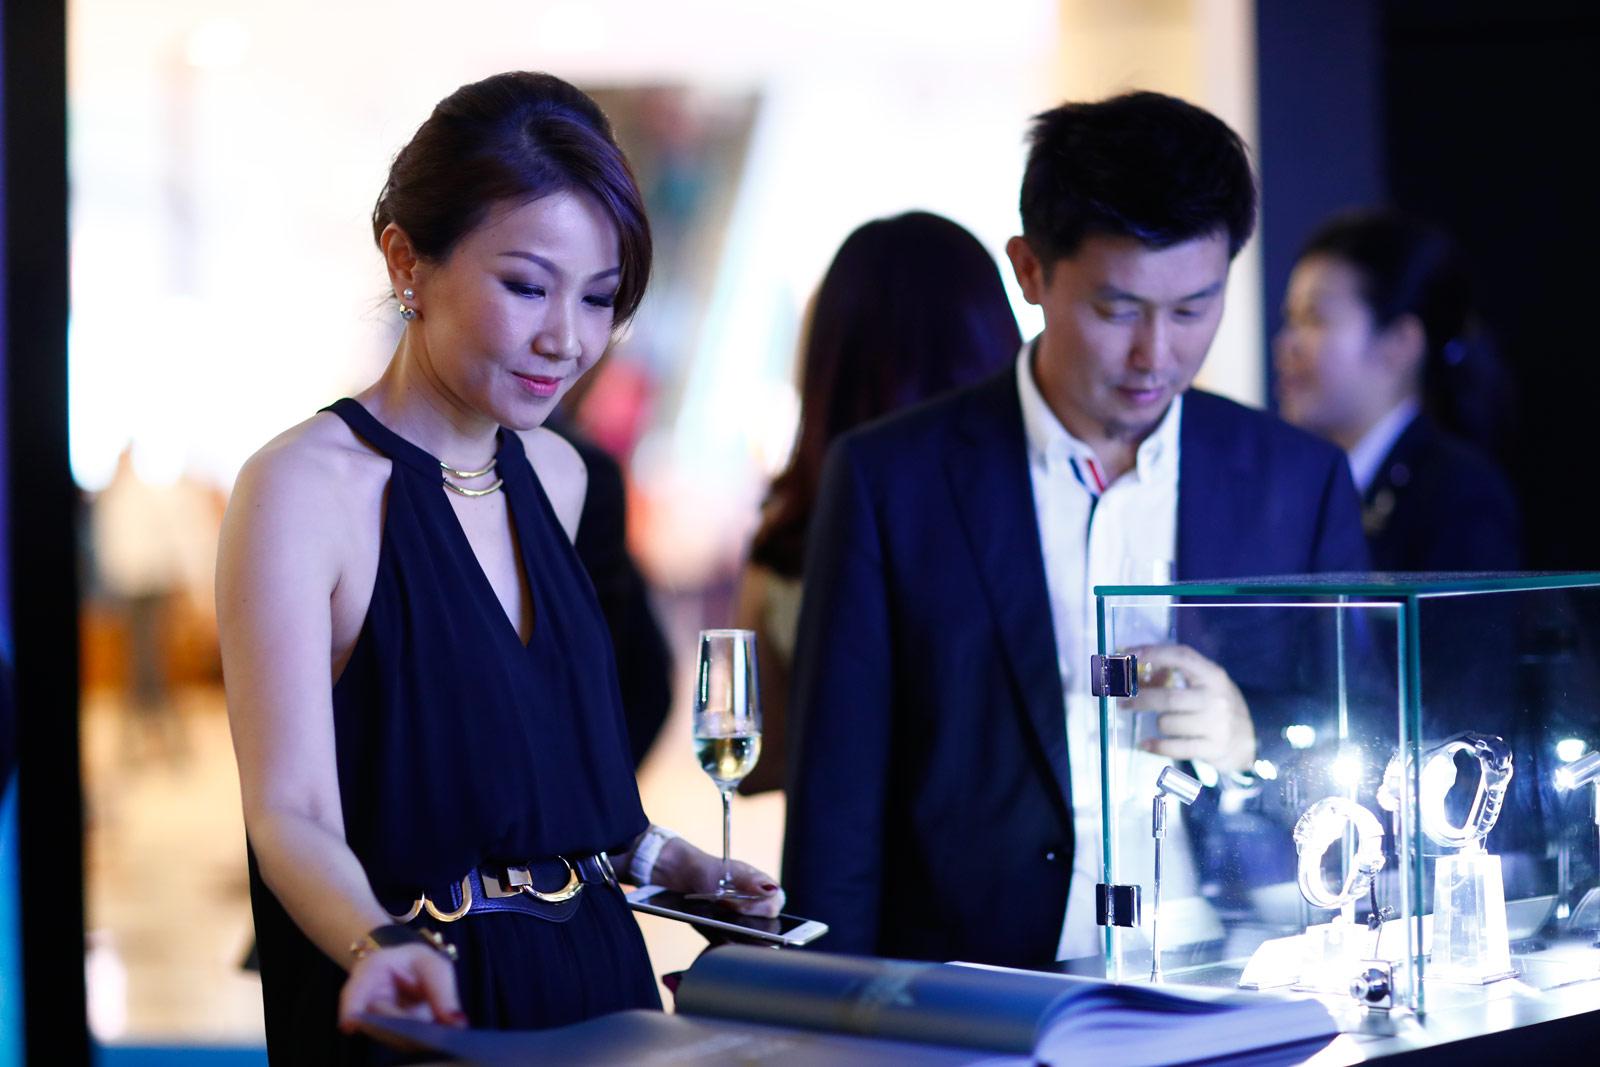 The Blancpain Ocean Commitment Exhibition In Kuala Lumpur